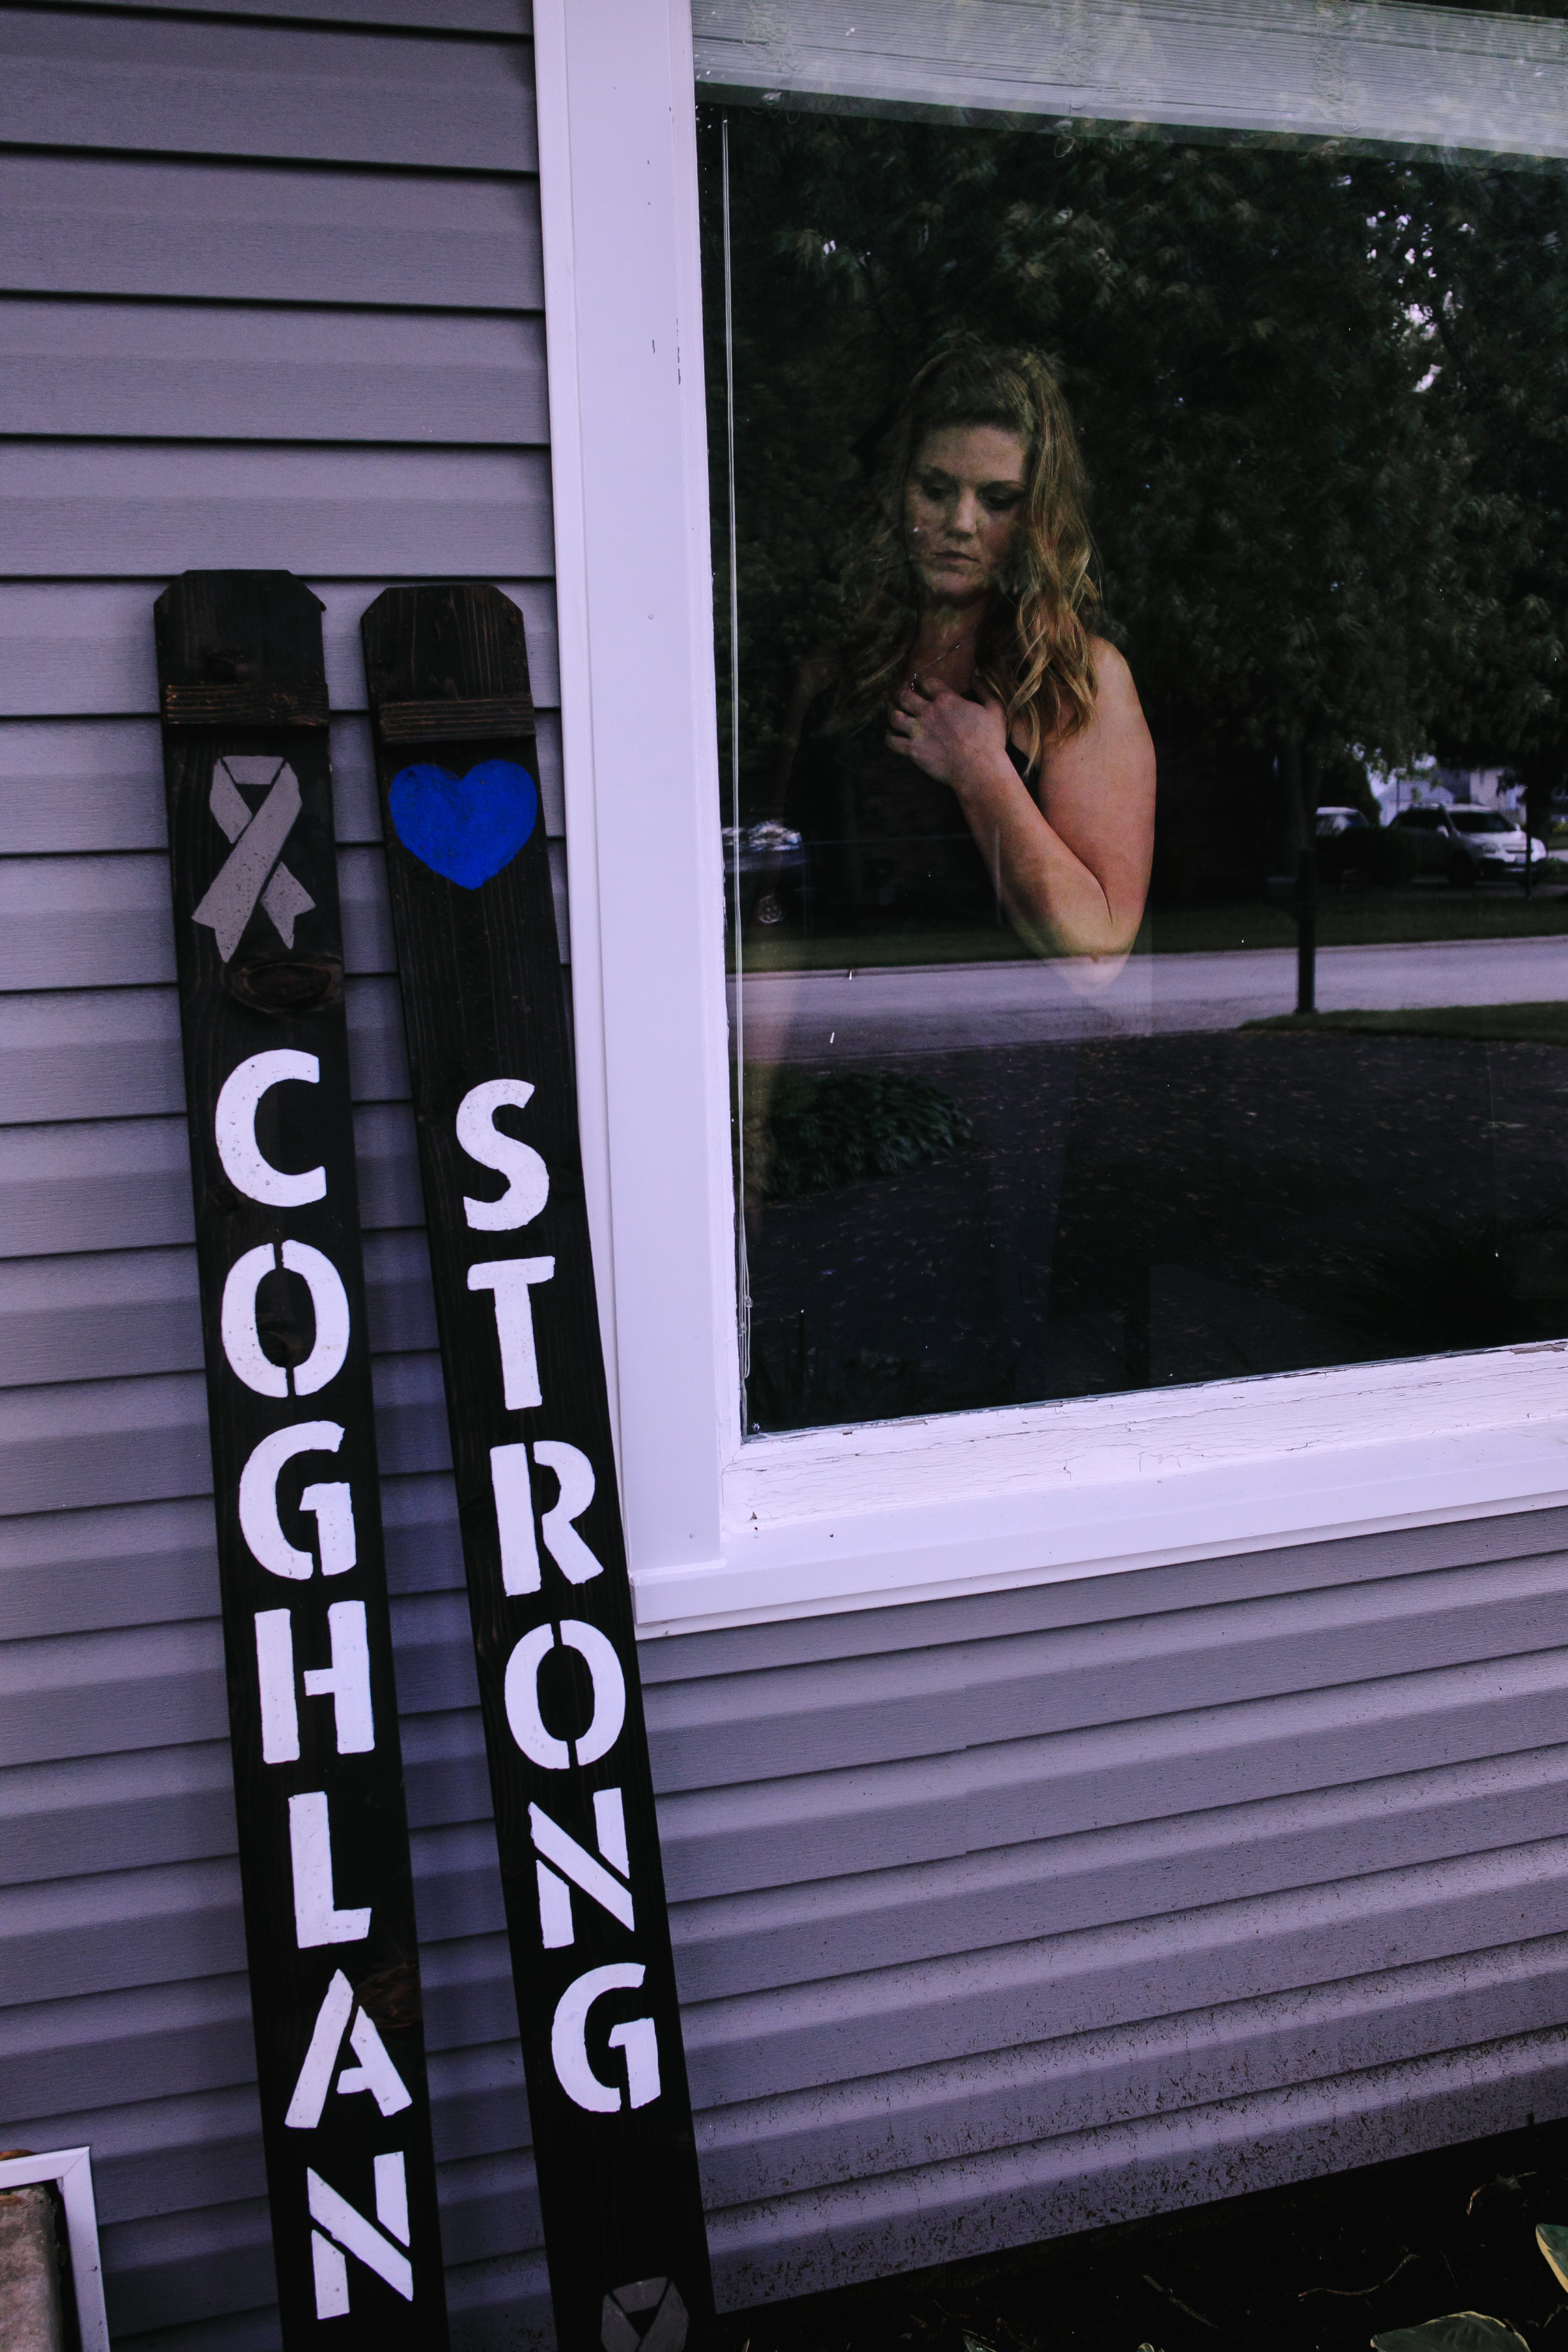 Dan-coghlan-terminally-ill-photographs-brain-cancer19.jpg